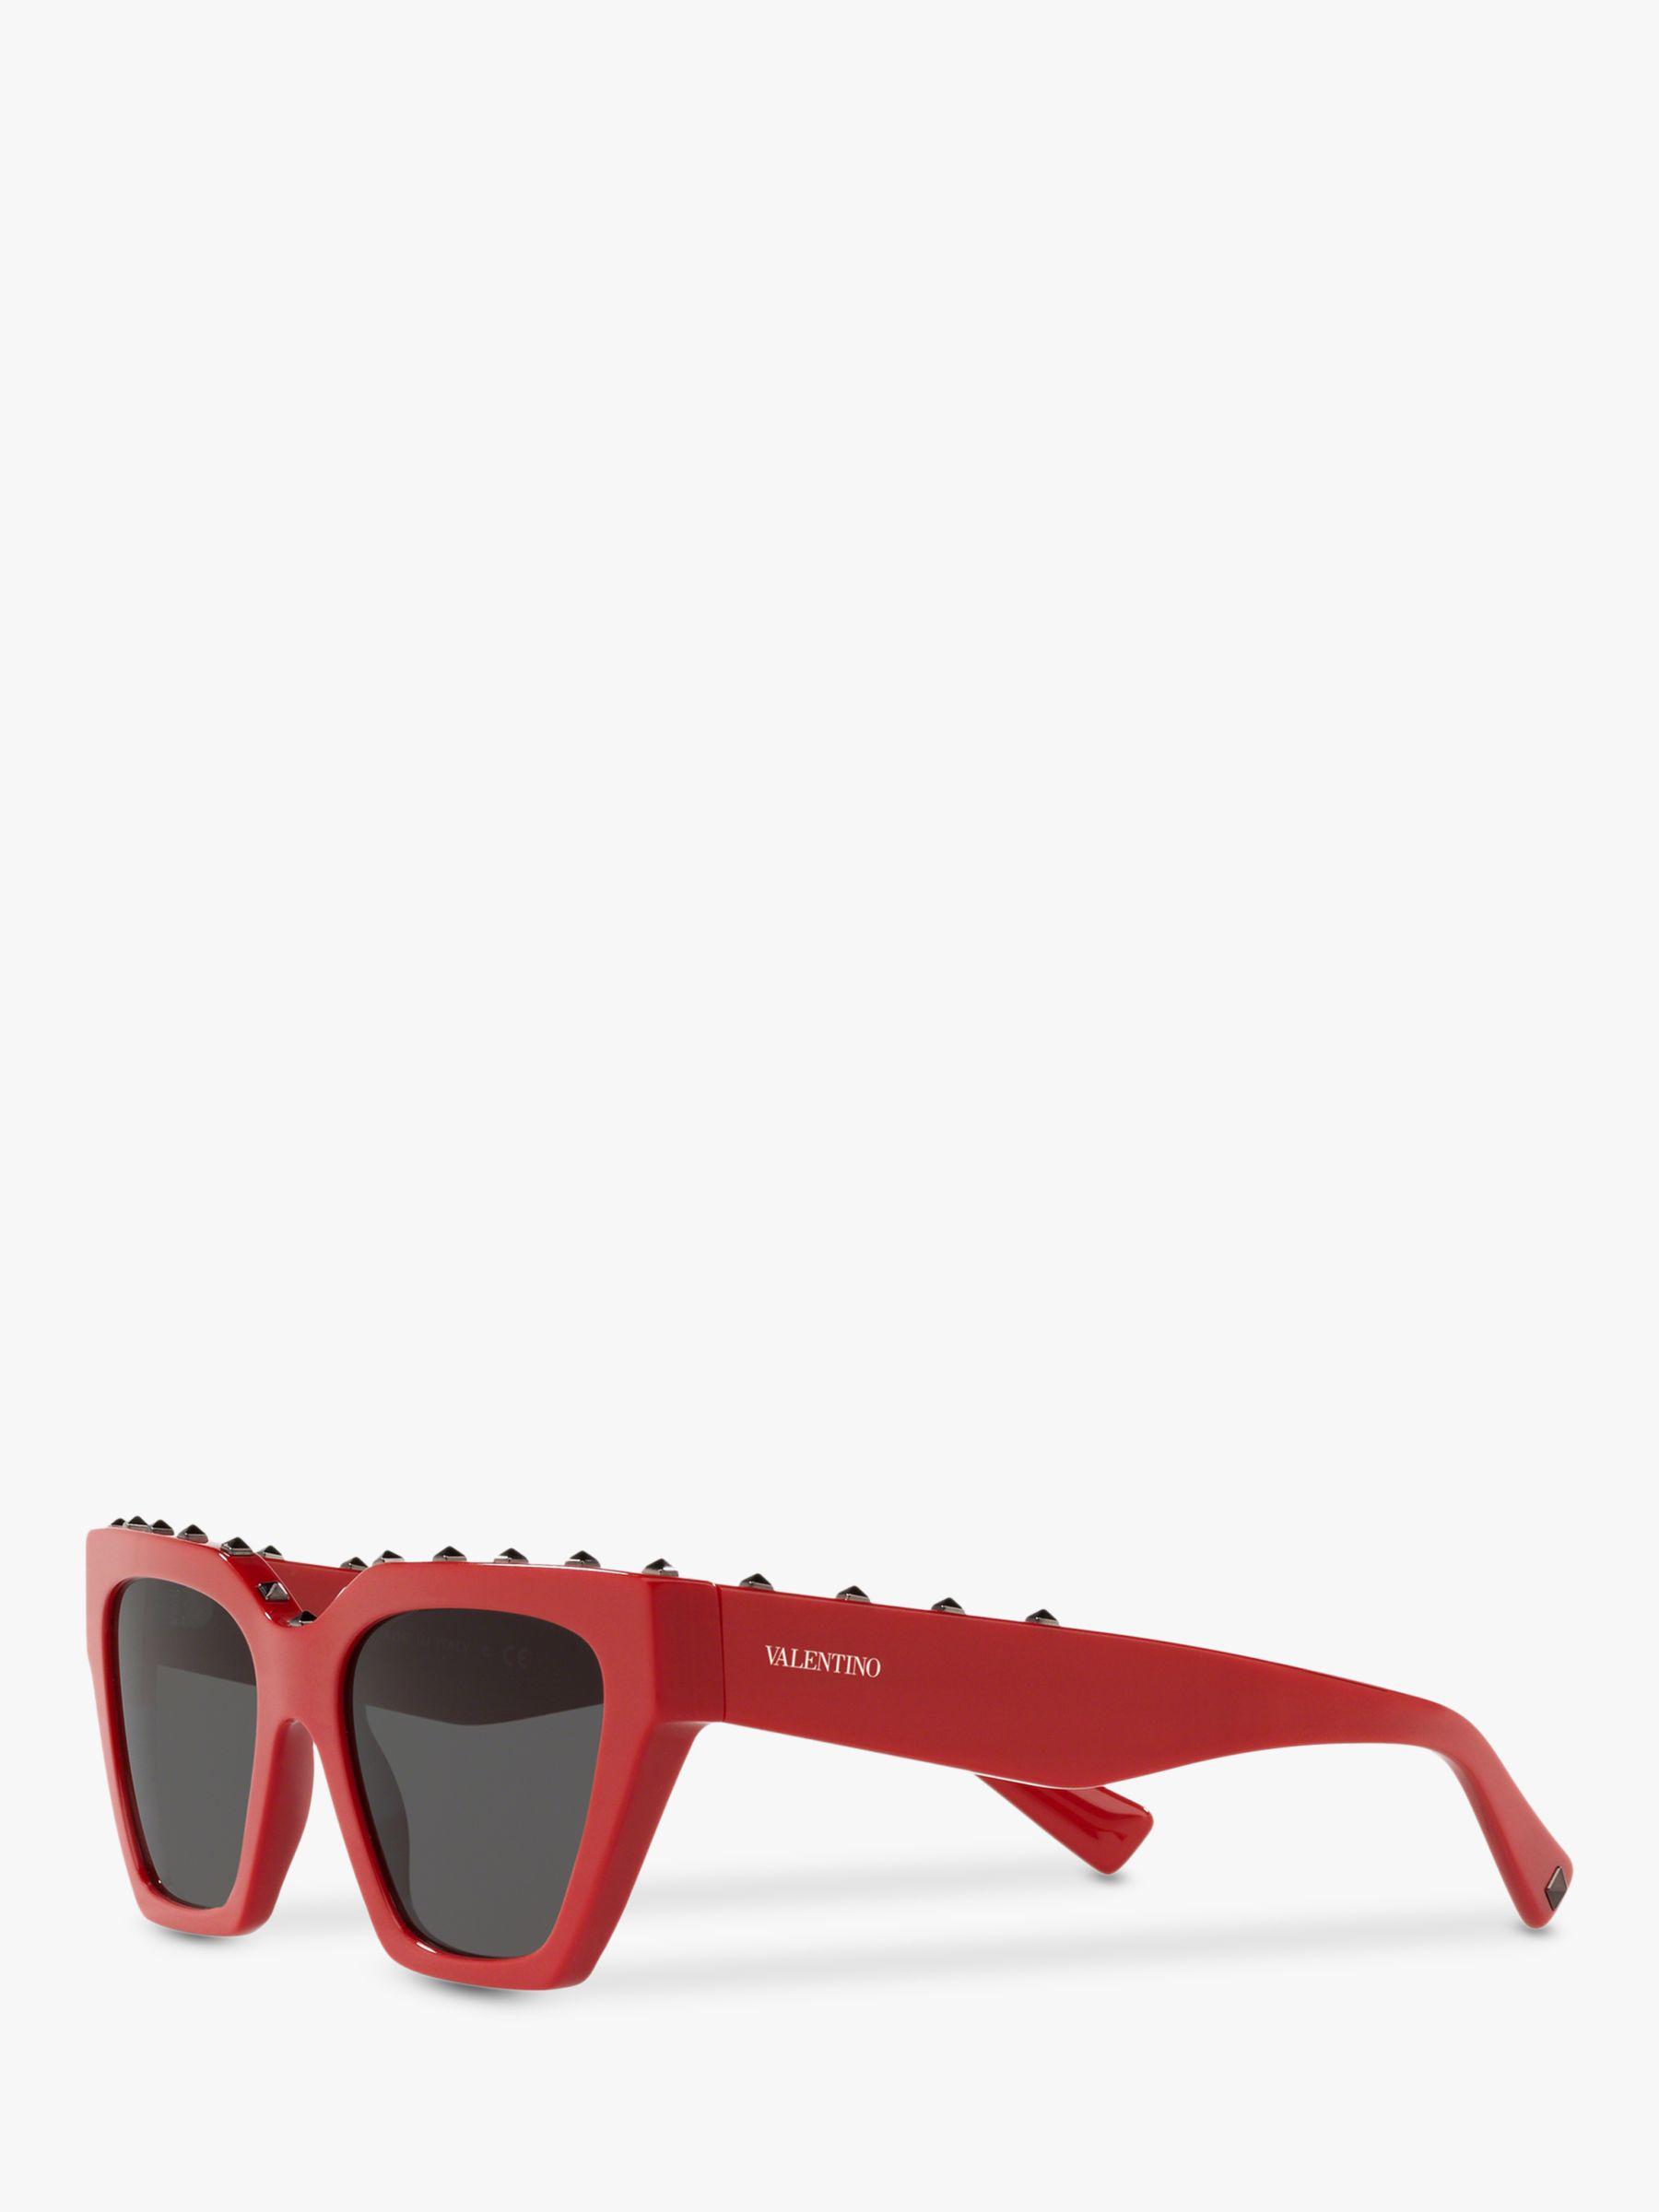 d645ae21b71f2 Valentino Va4046 Women s Studded Square Sunglasses in Red - Lyst